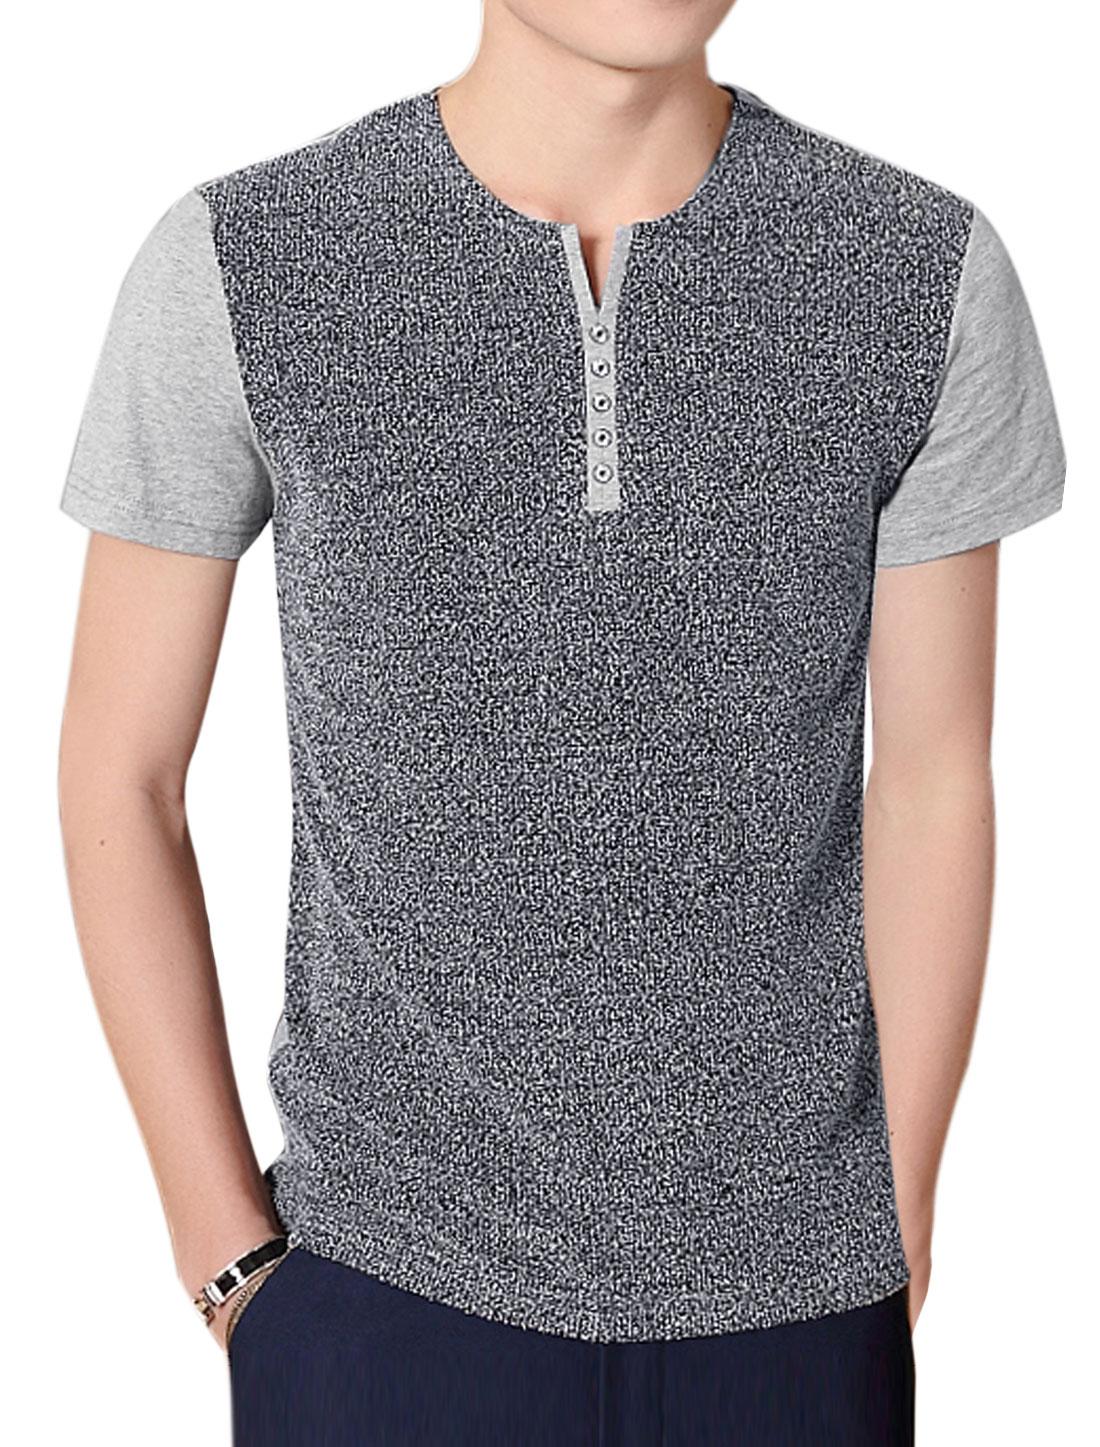 Men Split Neck Color Block Paneled Slim Fit Tee Grey M